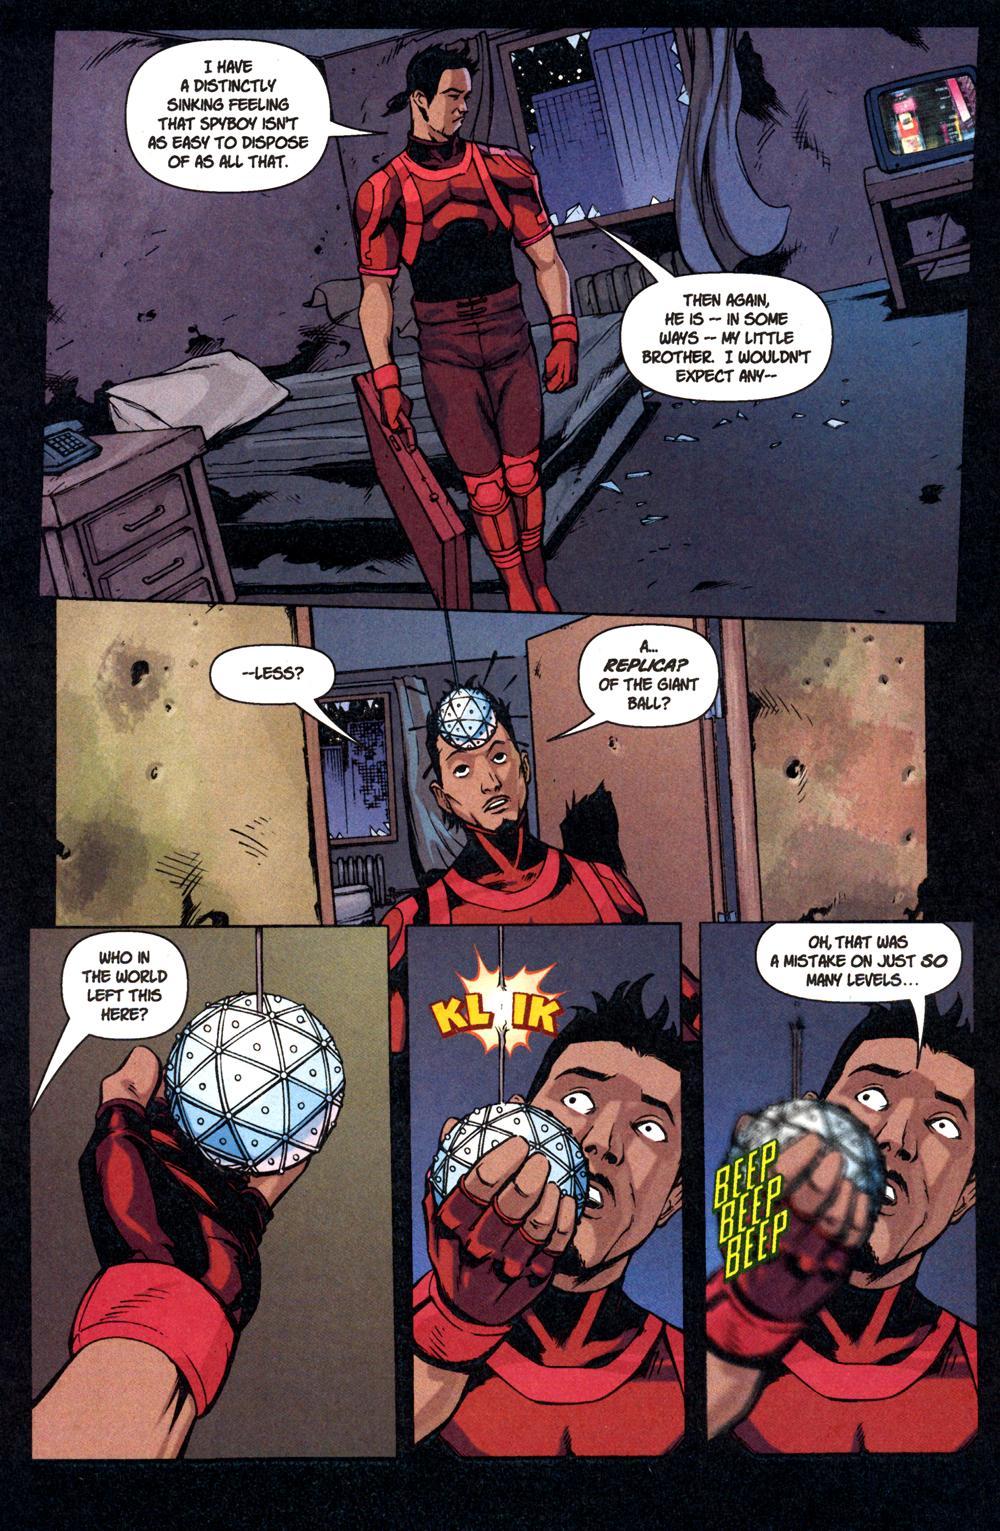 Read online SpyBoy: Final Exam comic -  Issue #1 - 10